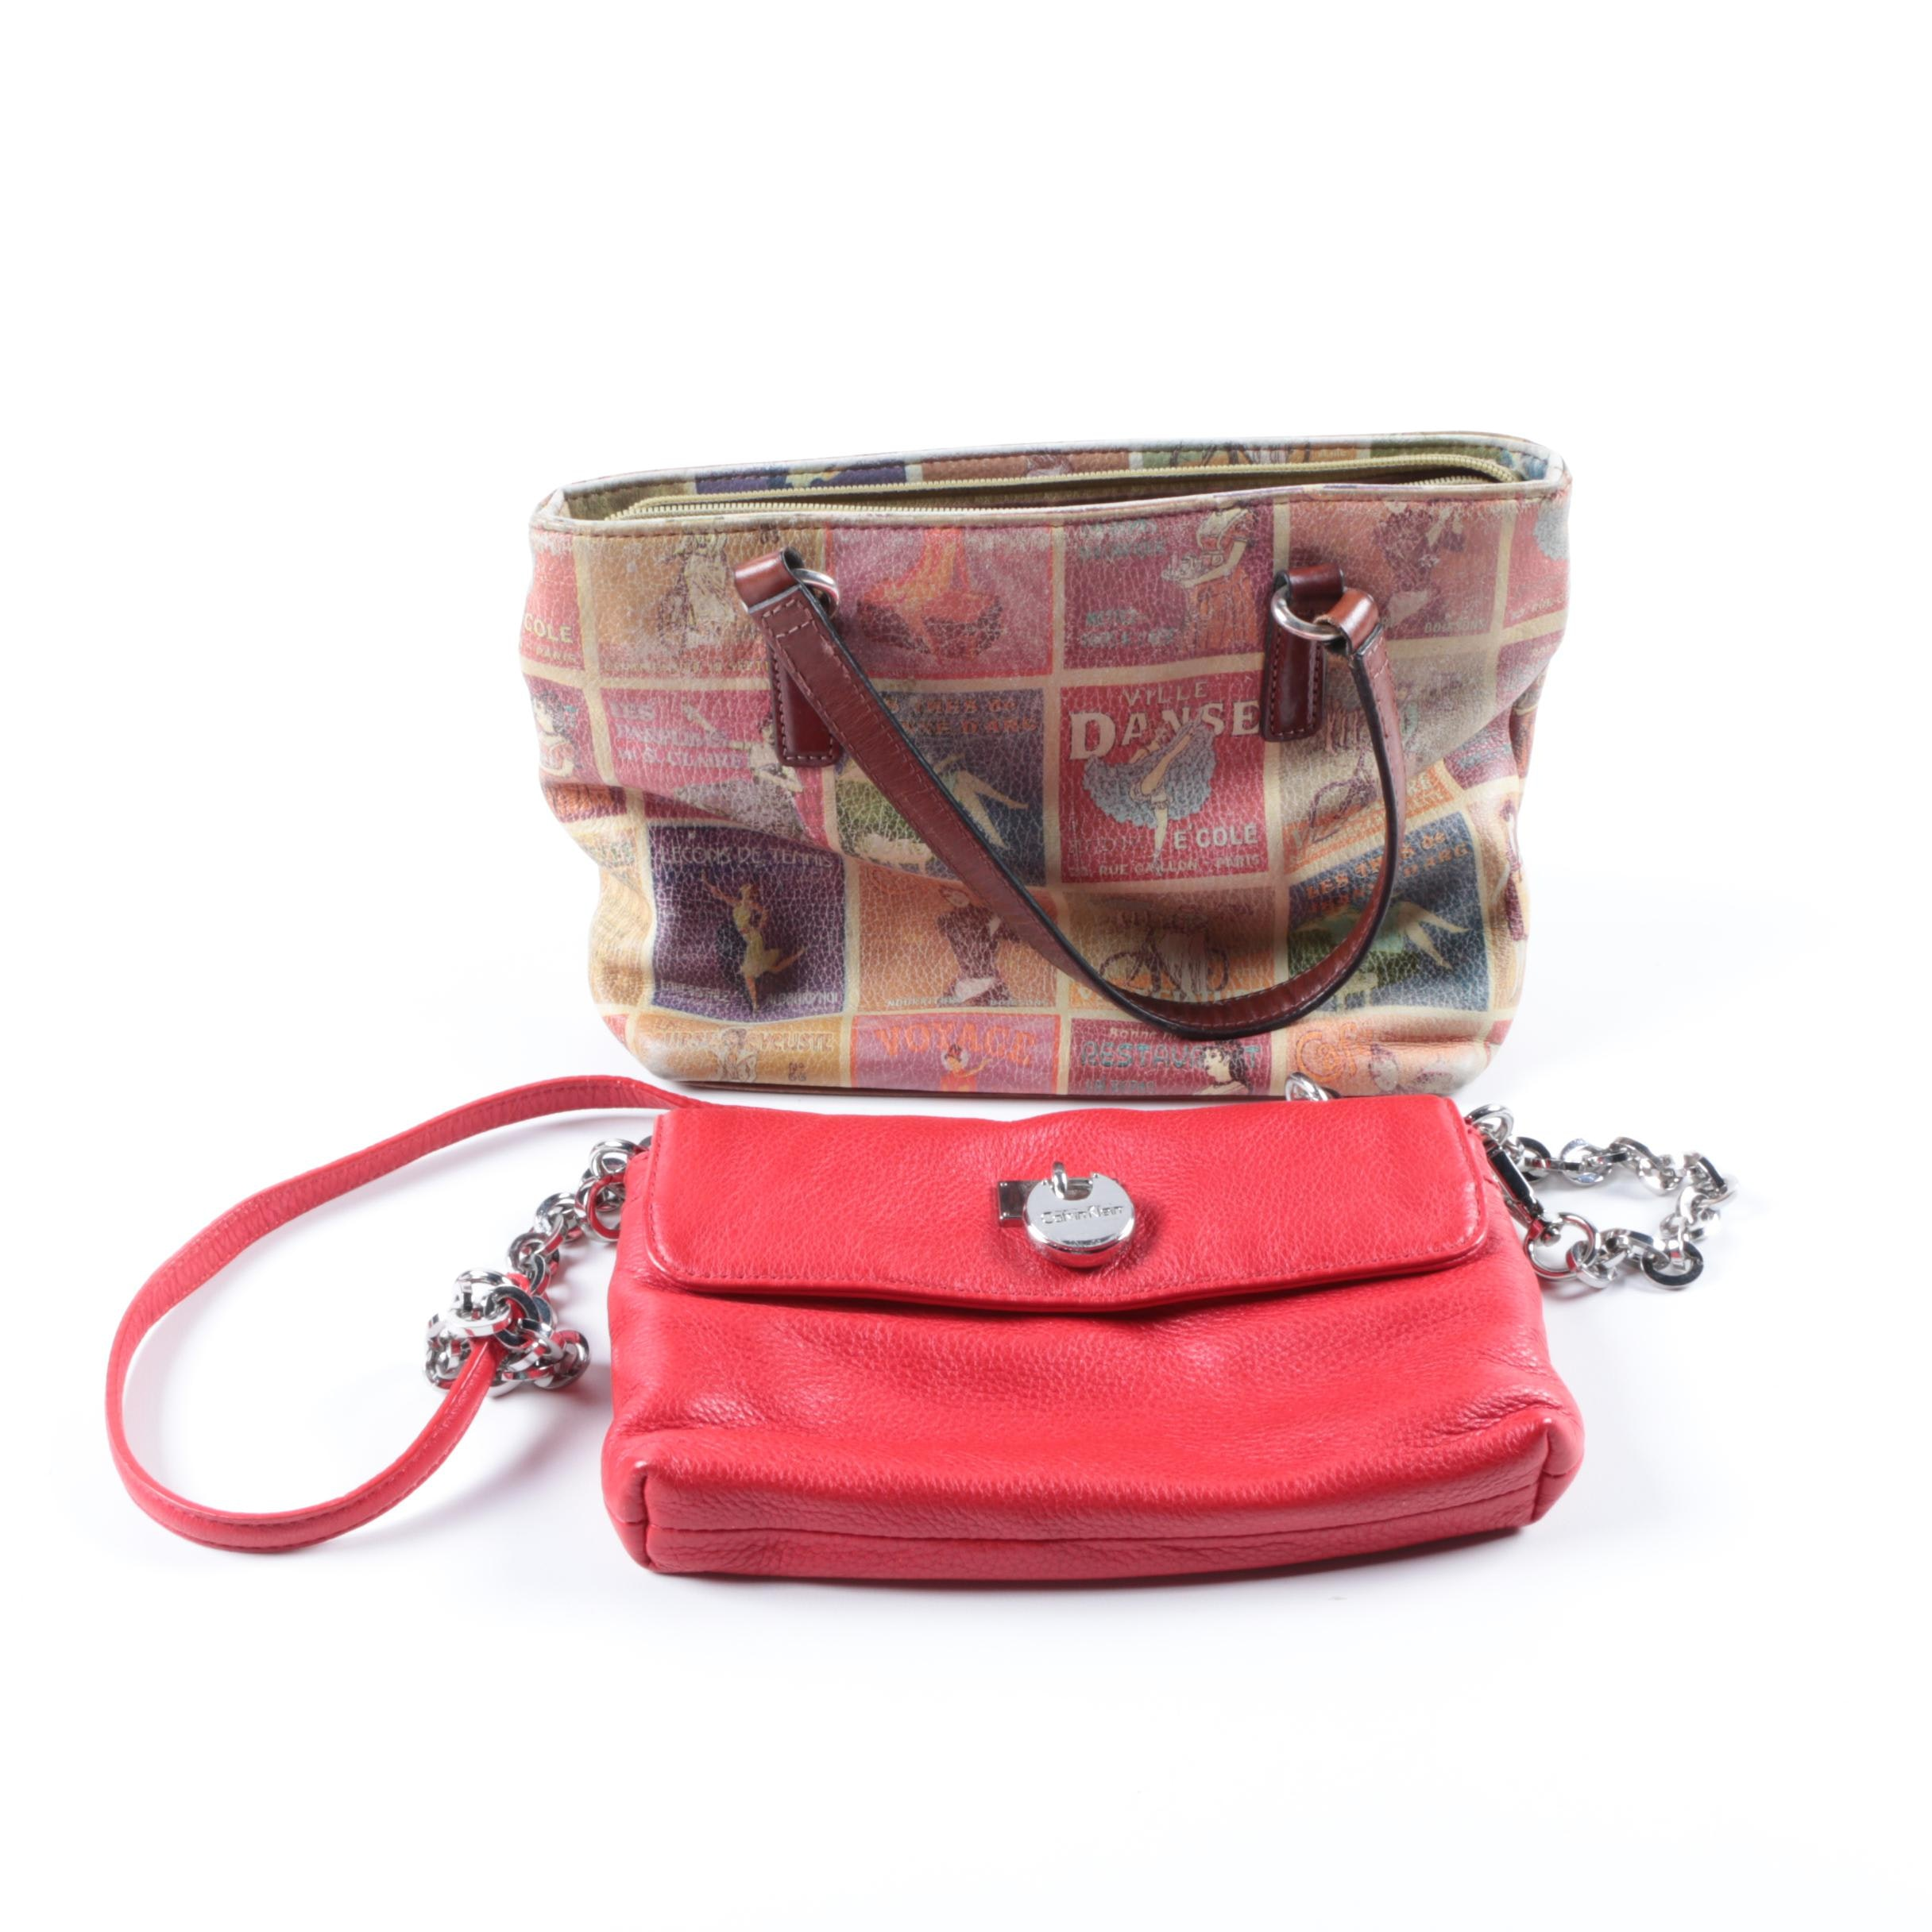 Fossil Handbag and Calvin Klein Crossbody Purse